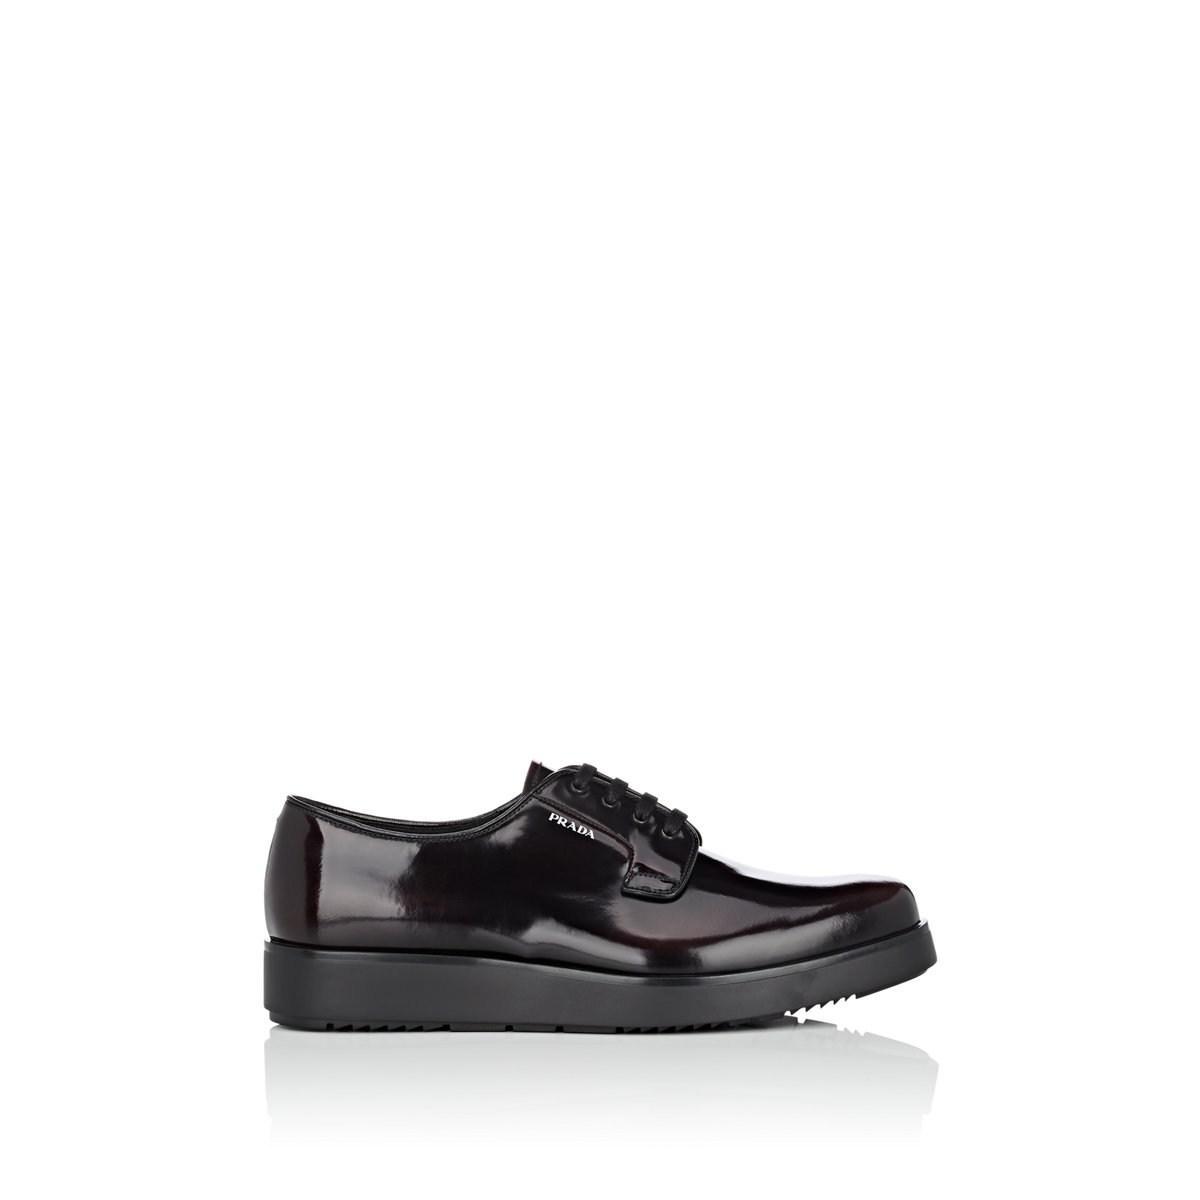 2e323e08558 Prada - Black Spazzolato Leather Platform Bluchers for Men - Lyst. View  fullscreen